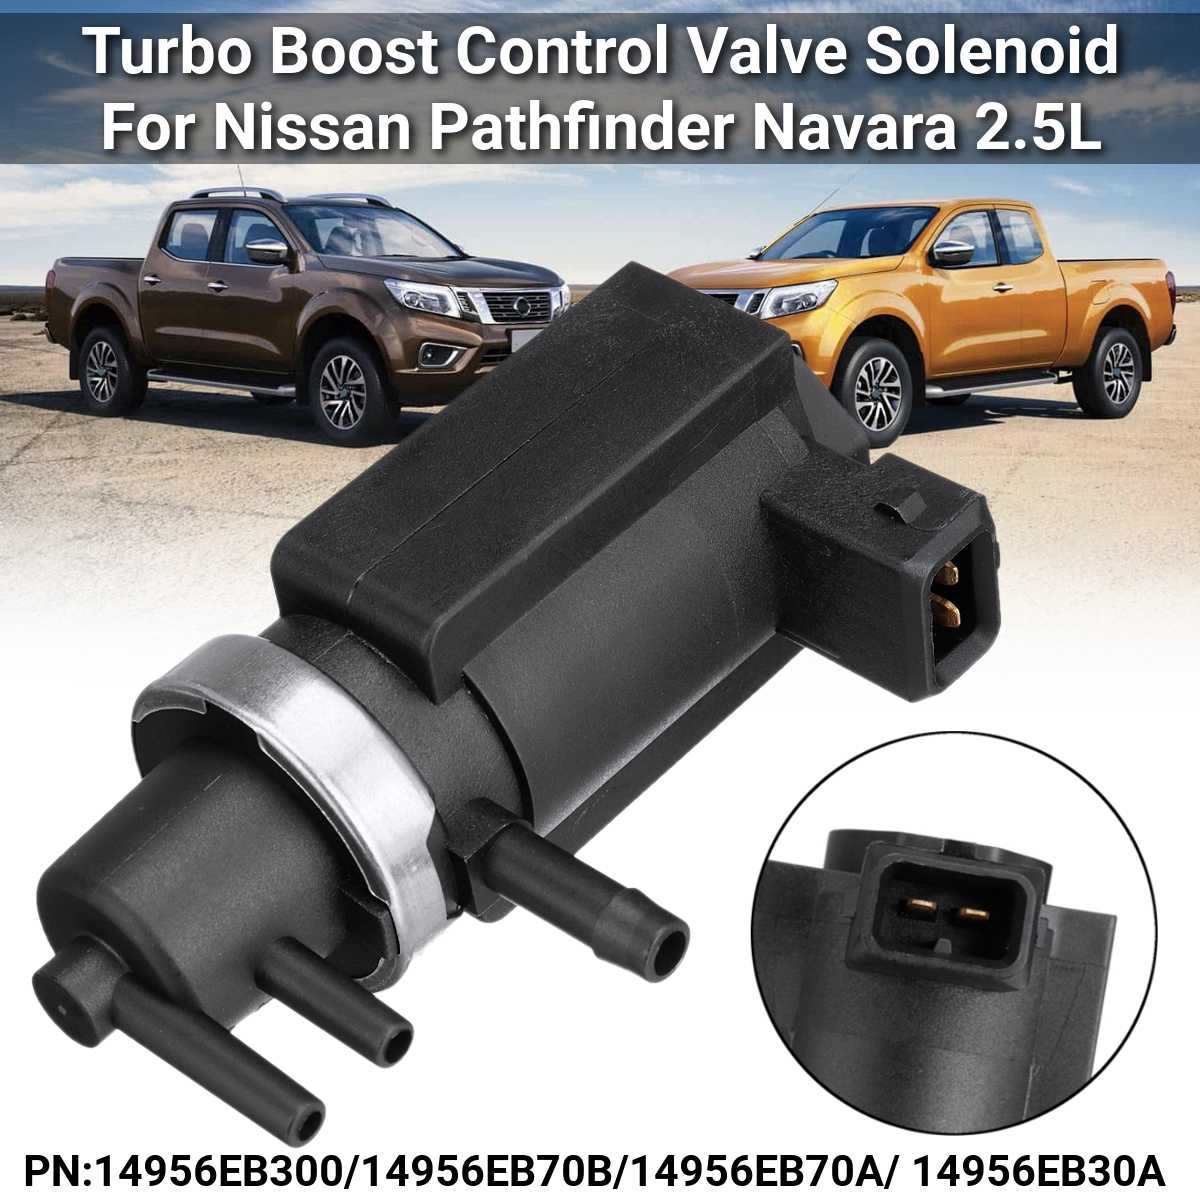 Turbo Boost Regelklep Magneetklep Voor Nissan Pathfinder Navara NP300 Pathfinder Pickup Cabstar Murano 2.5L 14956EB300 14956EB70